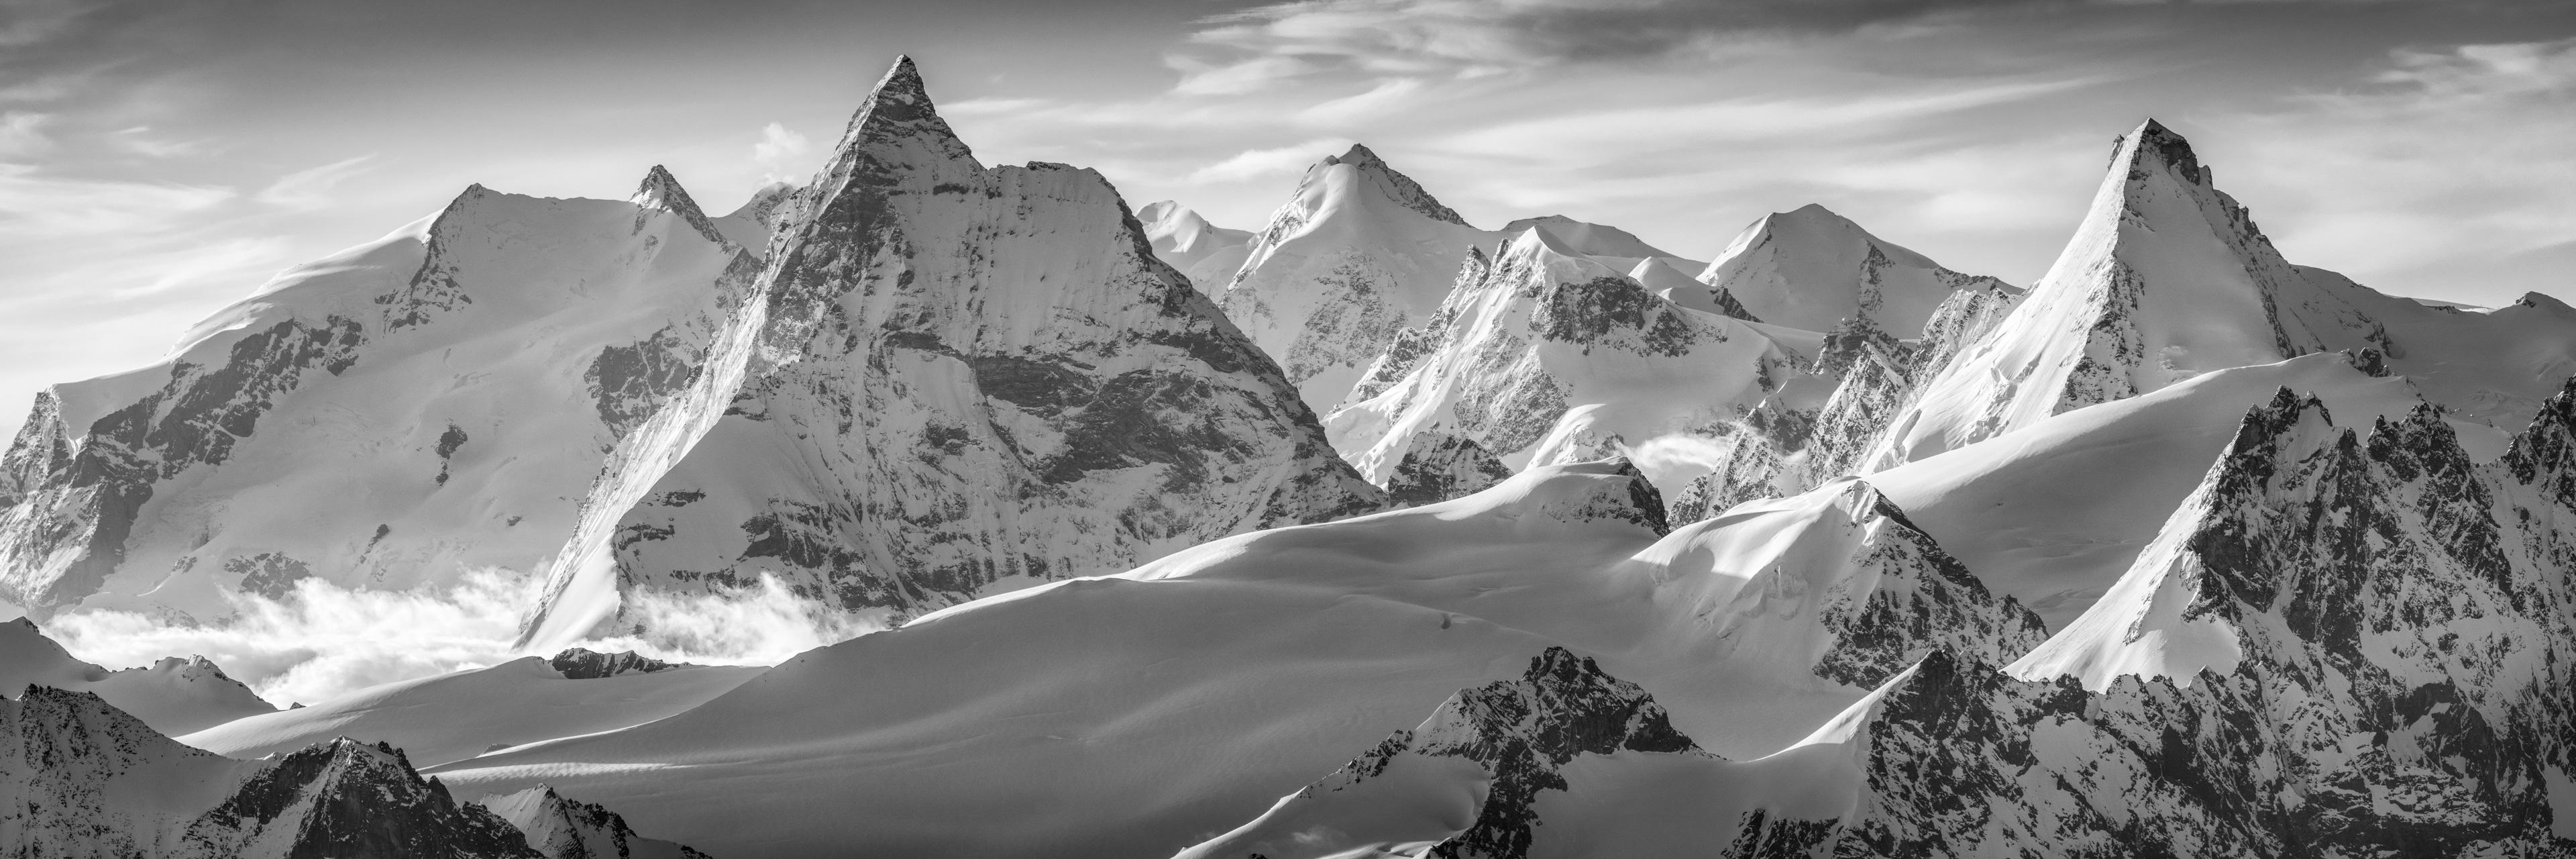 Tableau panorama paysage montagne -